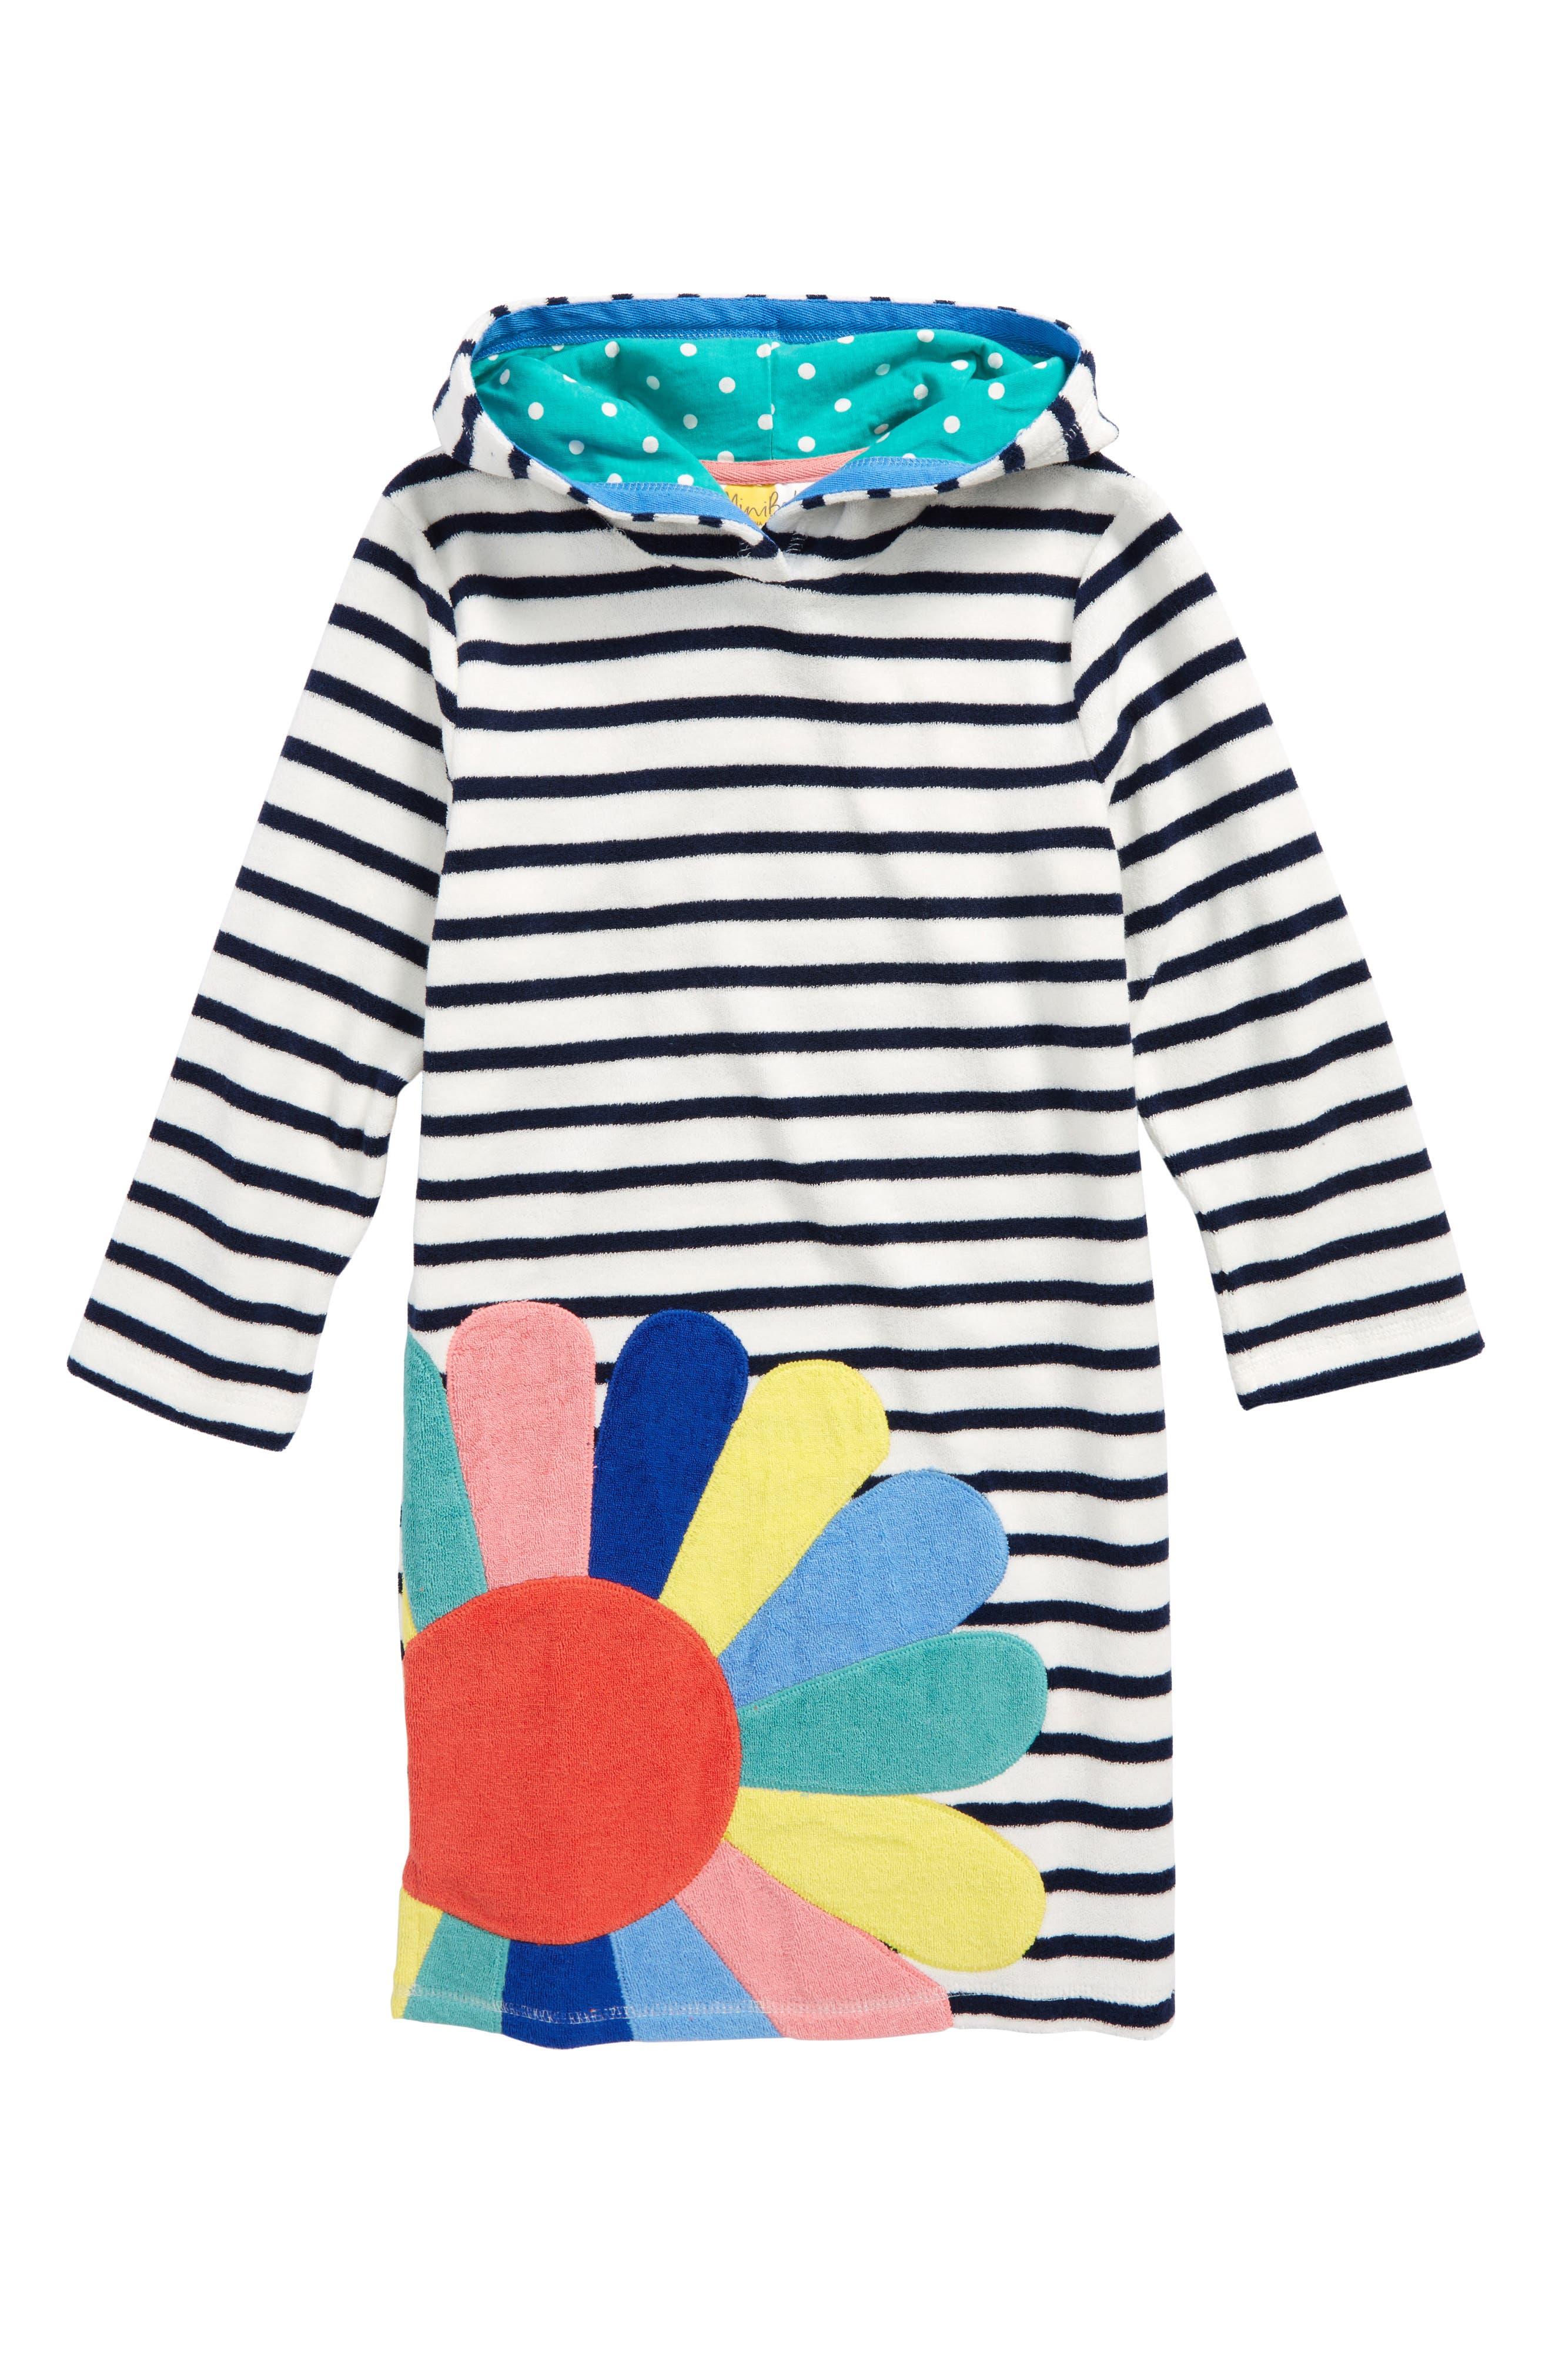 Appliqué Toweling Beach Dress,                             Main thumbnail 1, color,                             Ivory/ School Navy Nav